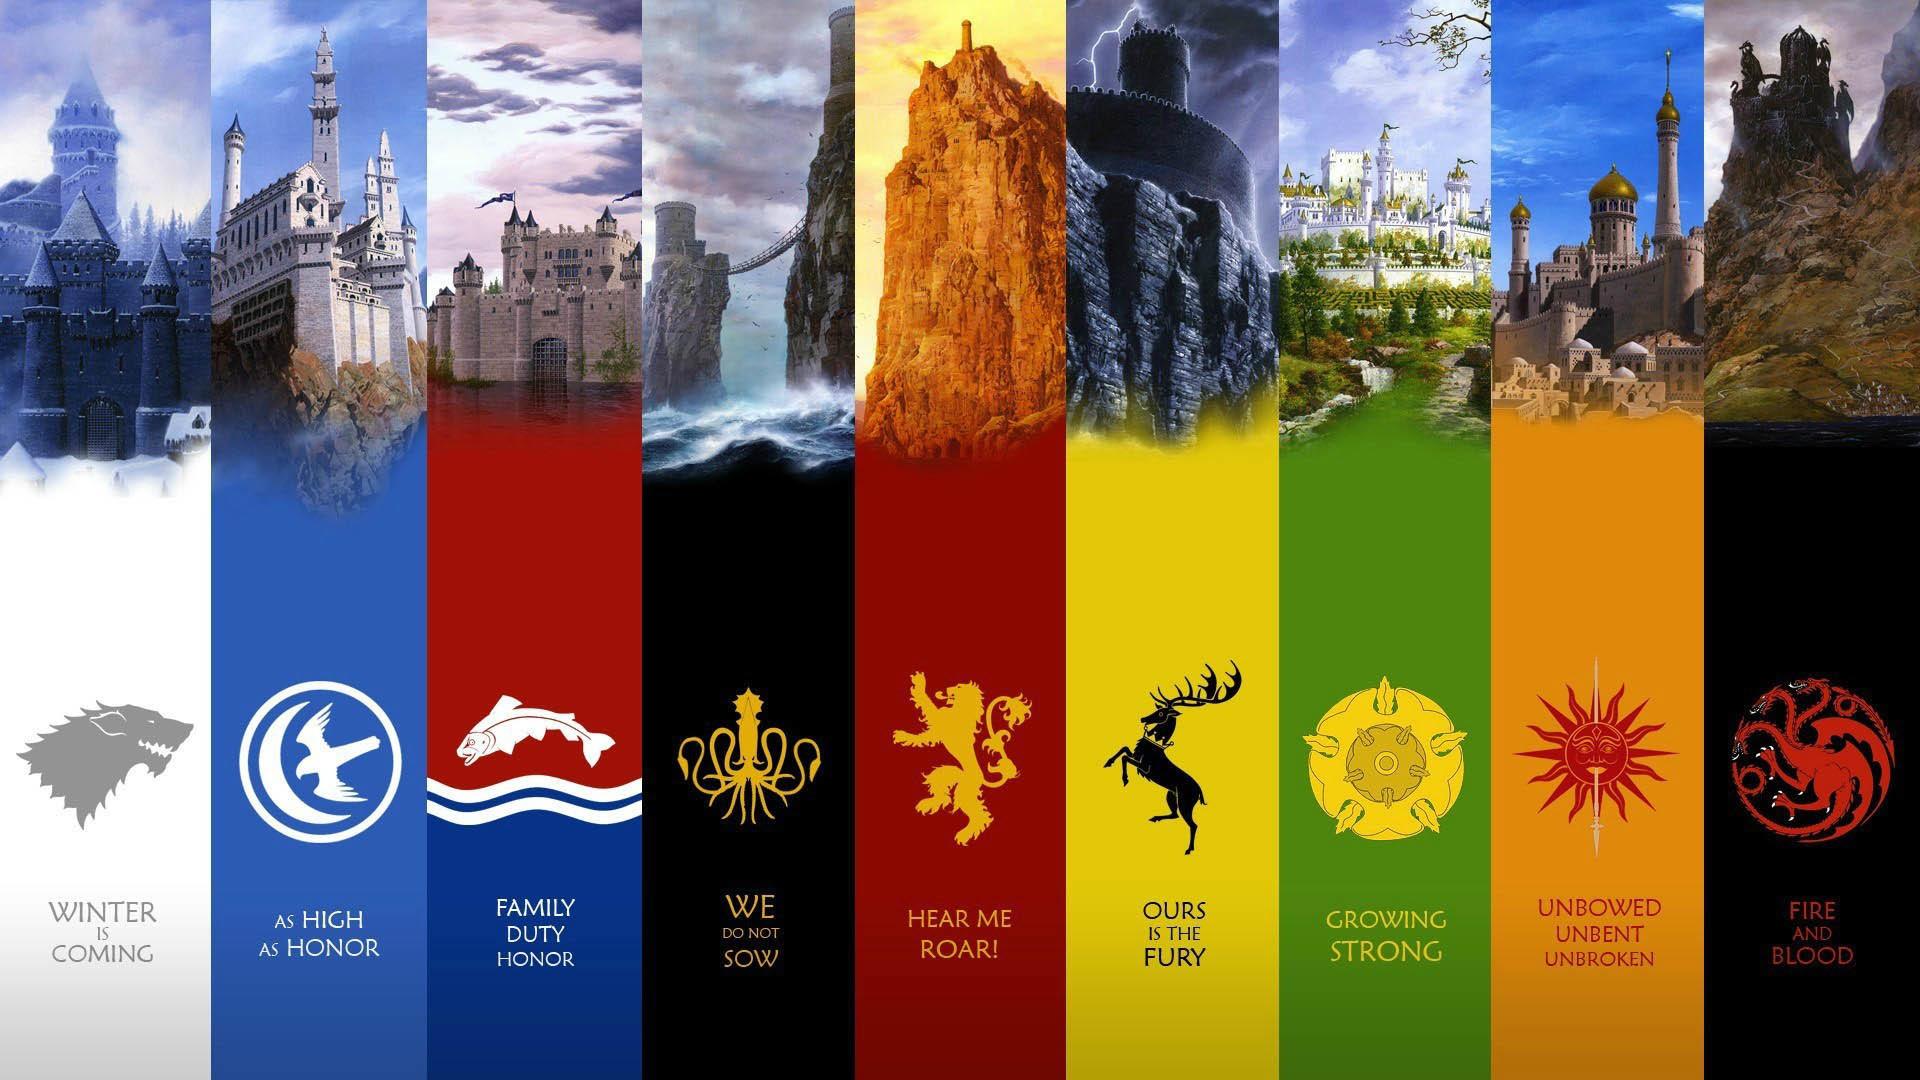 Game of Thrones House Flag & Castle wallpaper